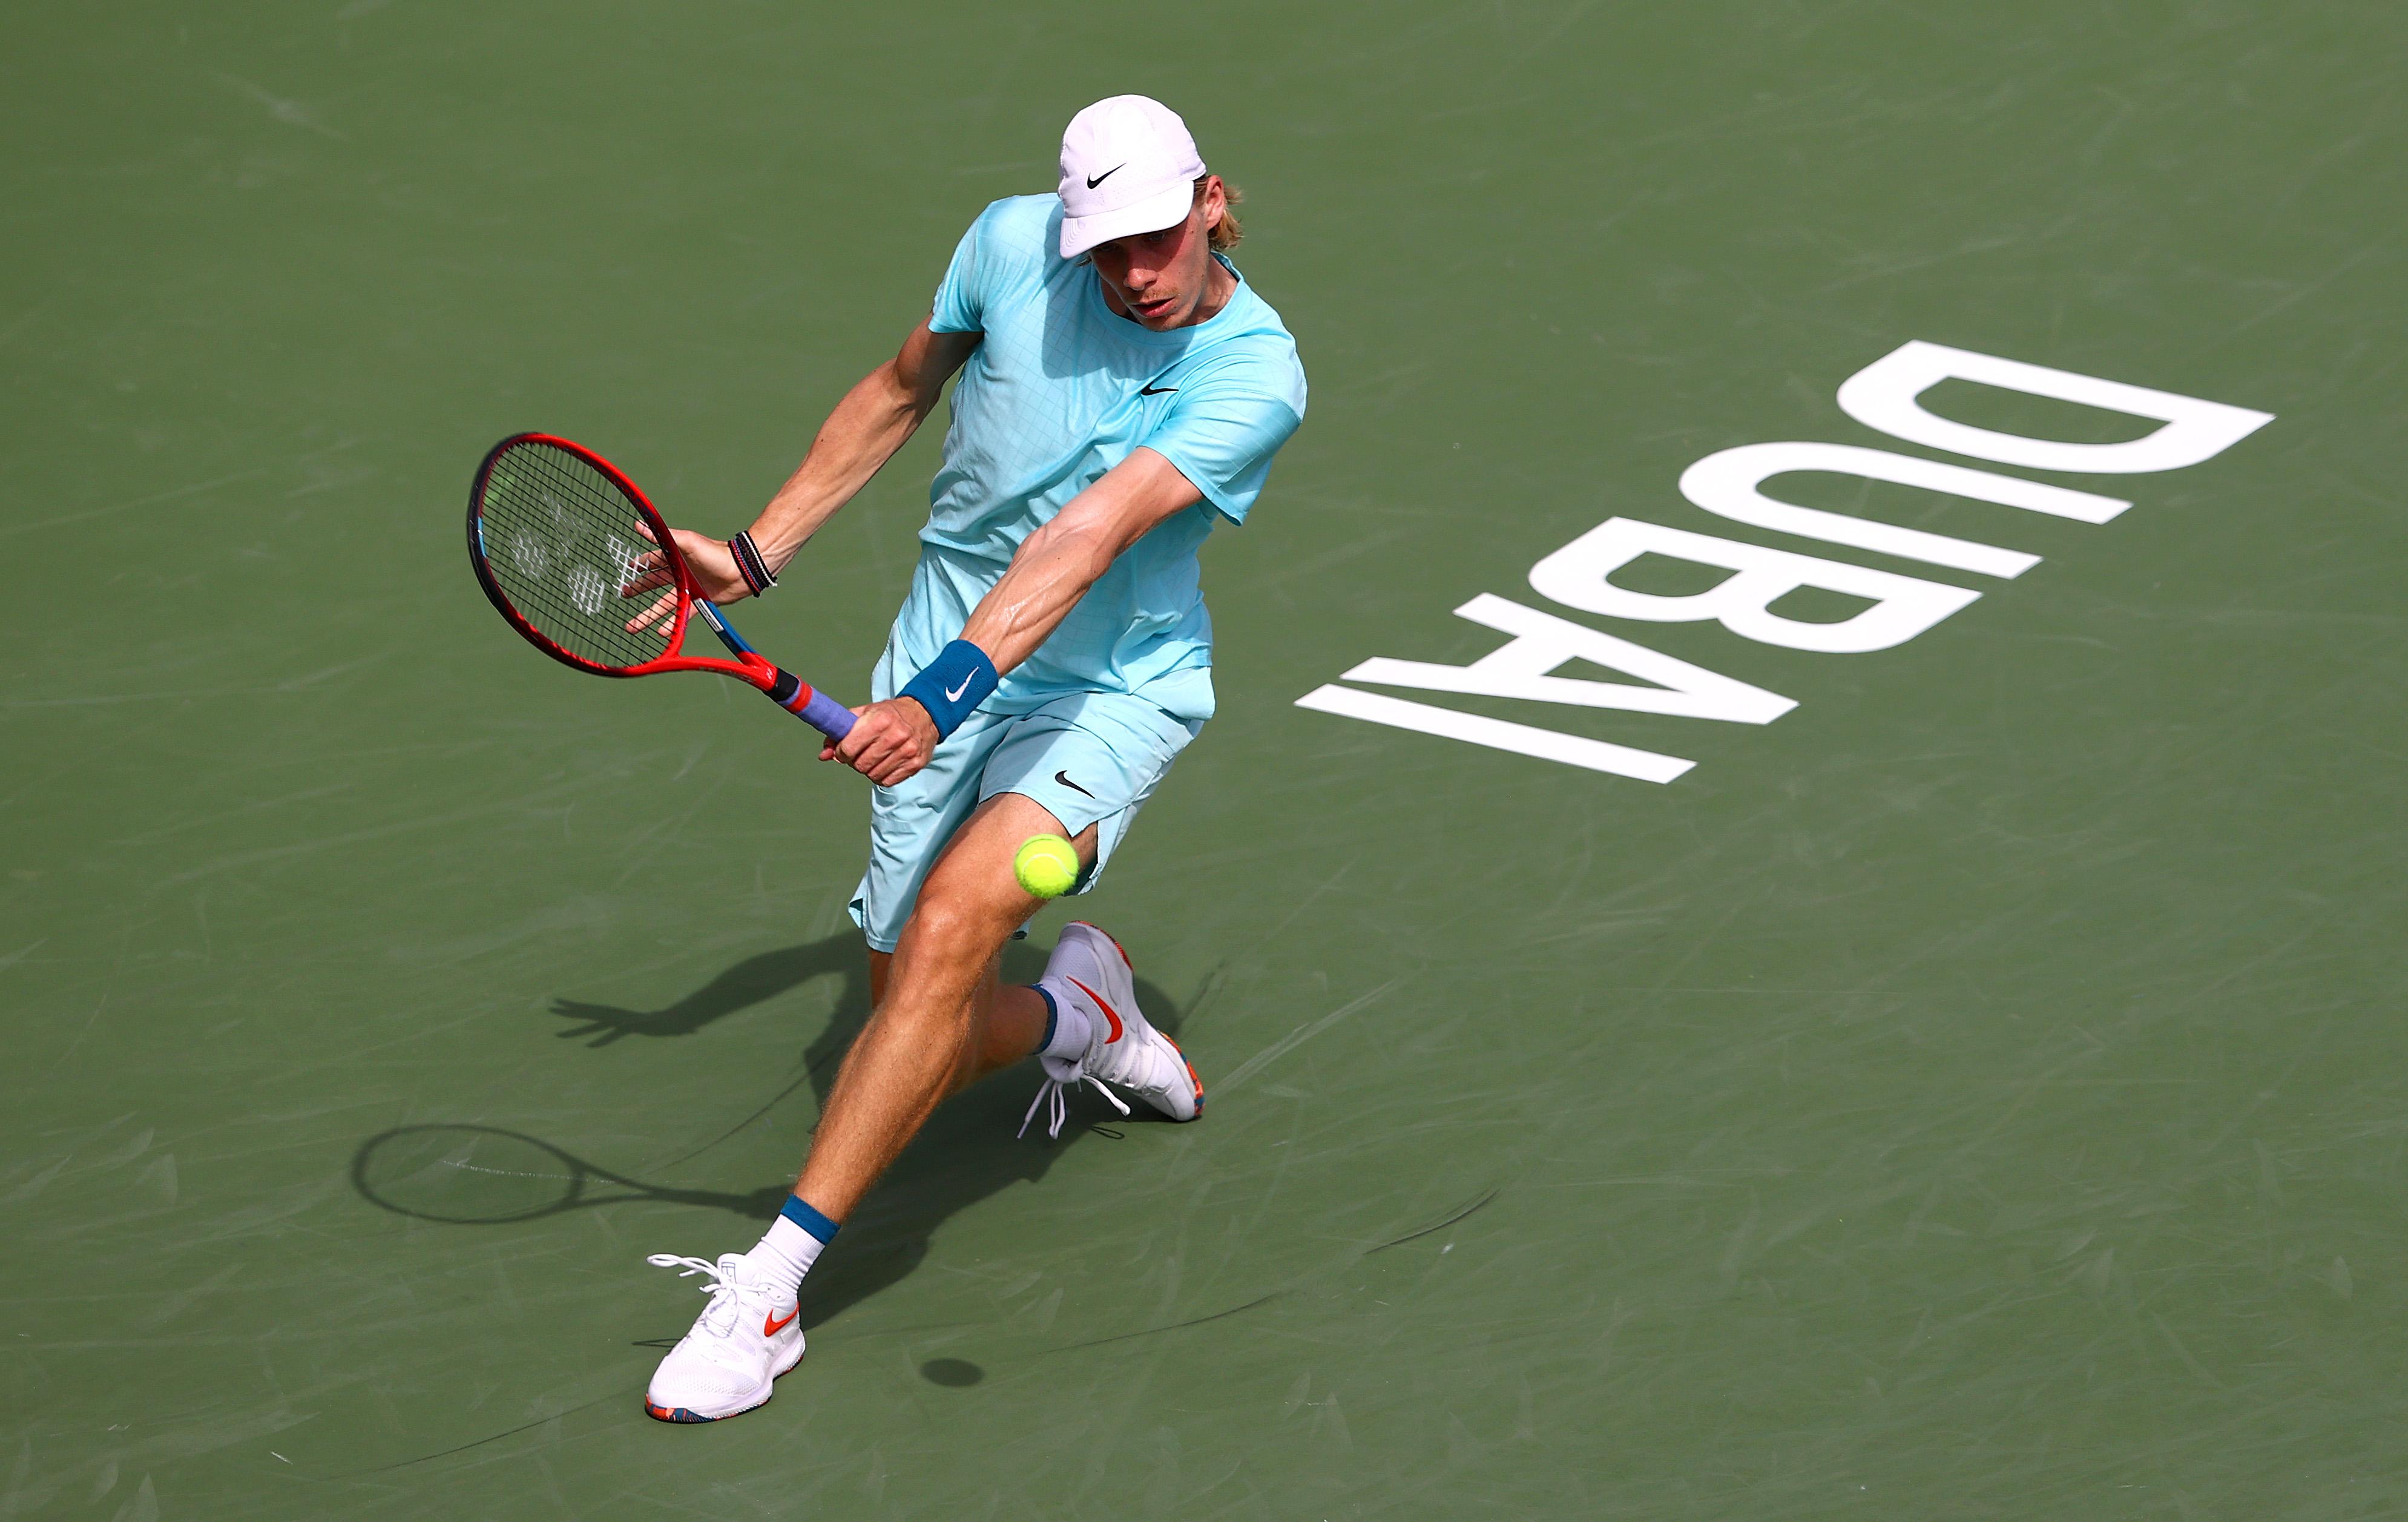 Dubai Open 2021: Denis Shapovalov vs. Lloyd Harris Tennis Pick and Prediction